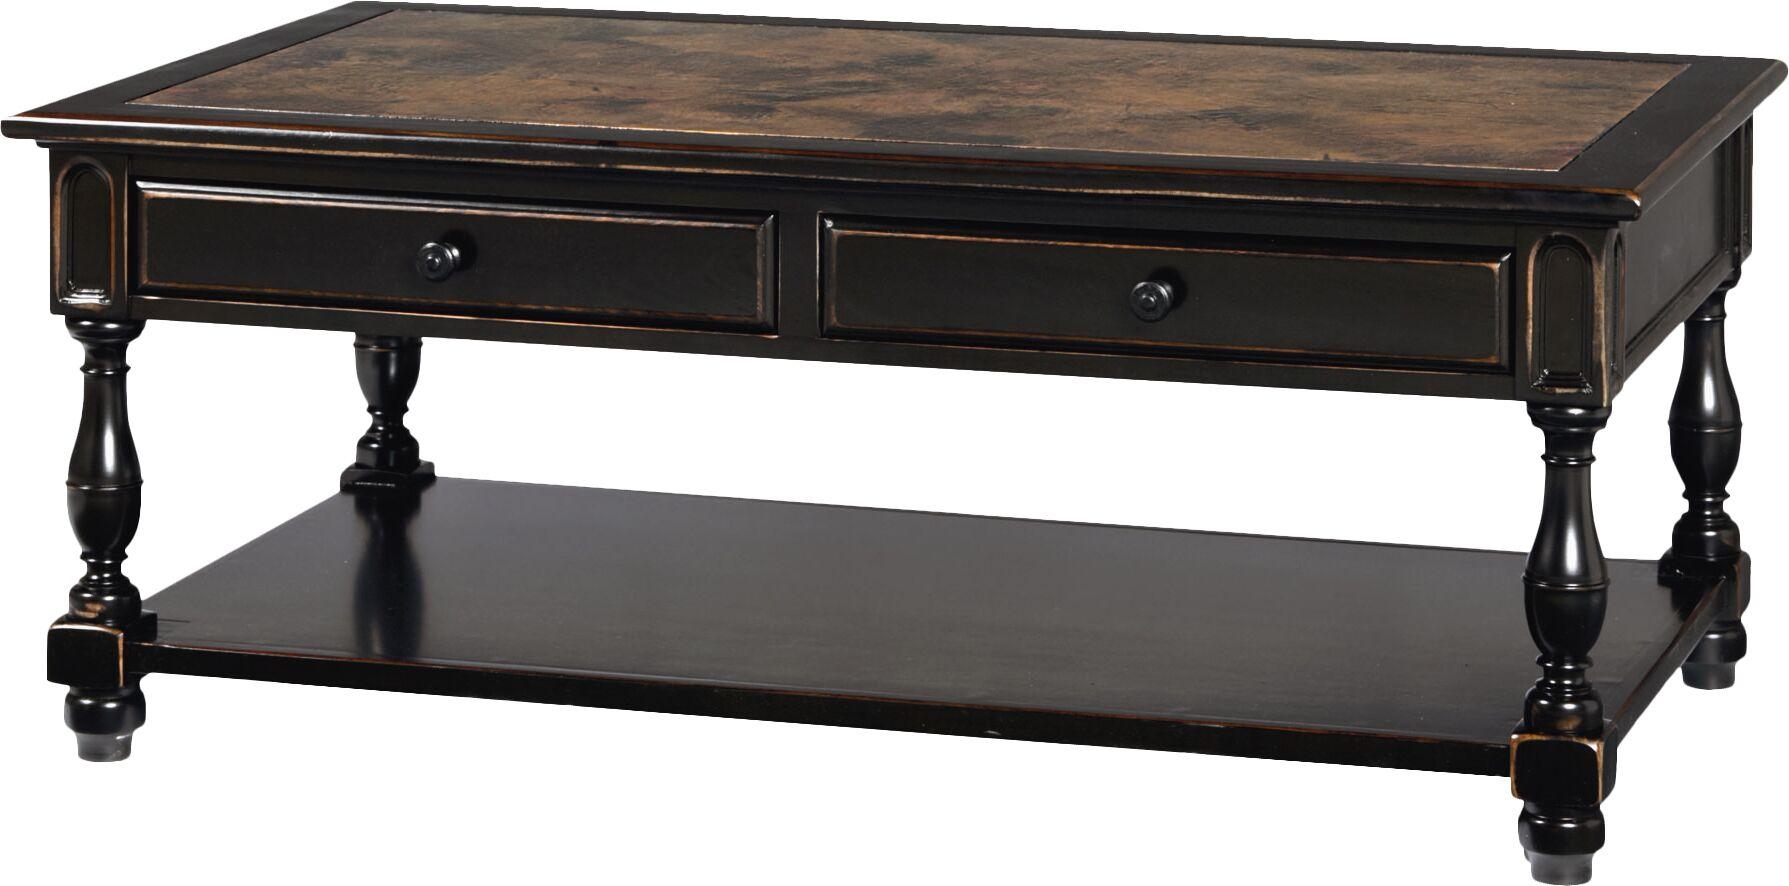 Durango Coffee Table with Storage